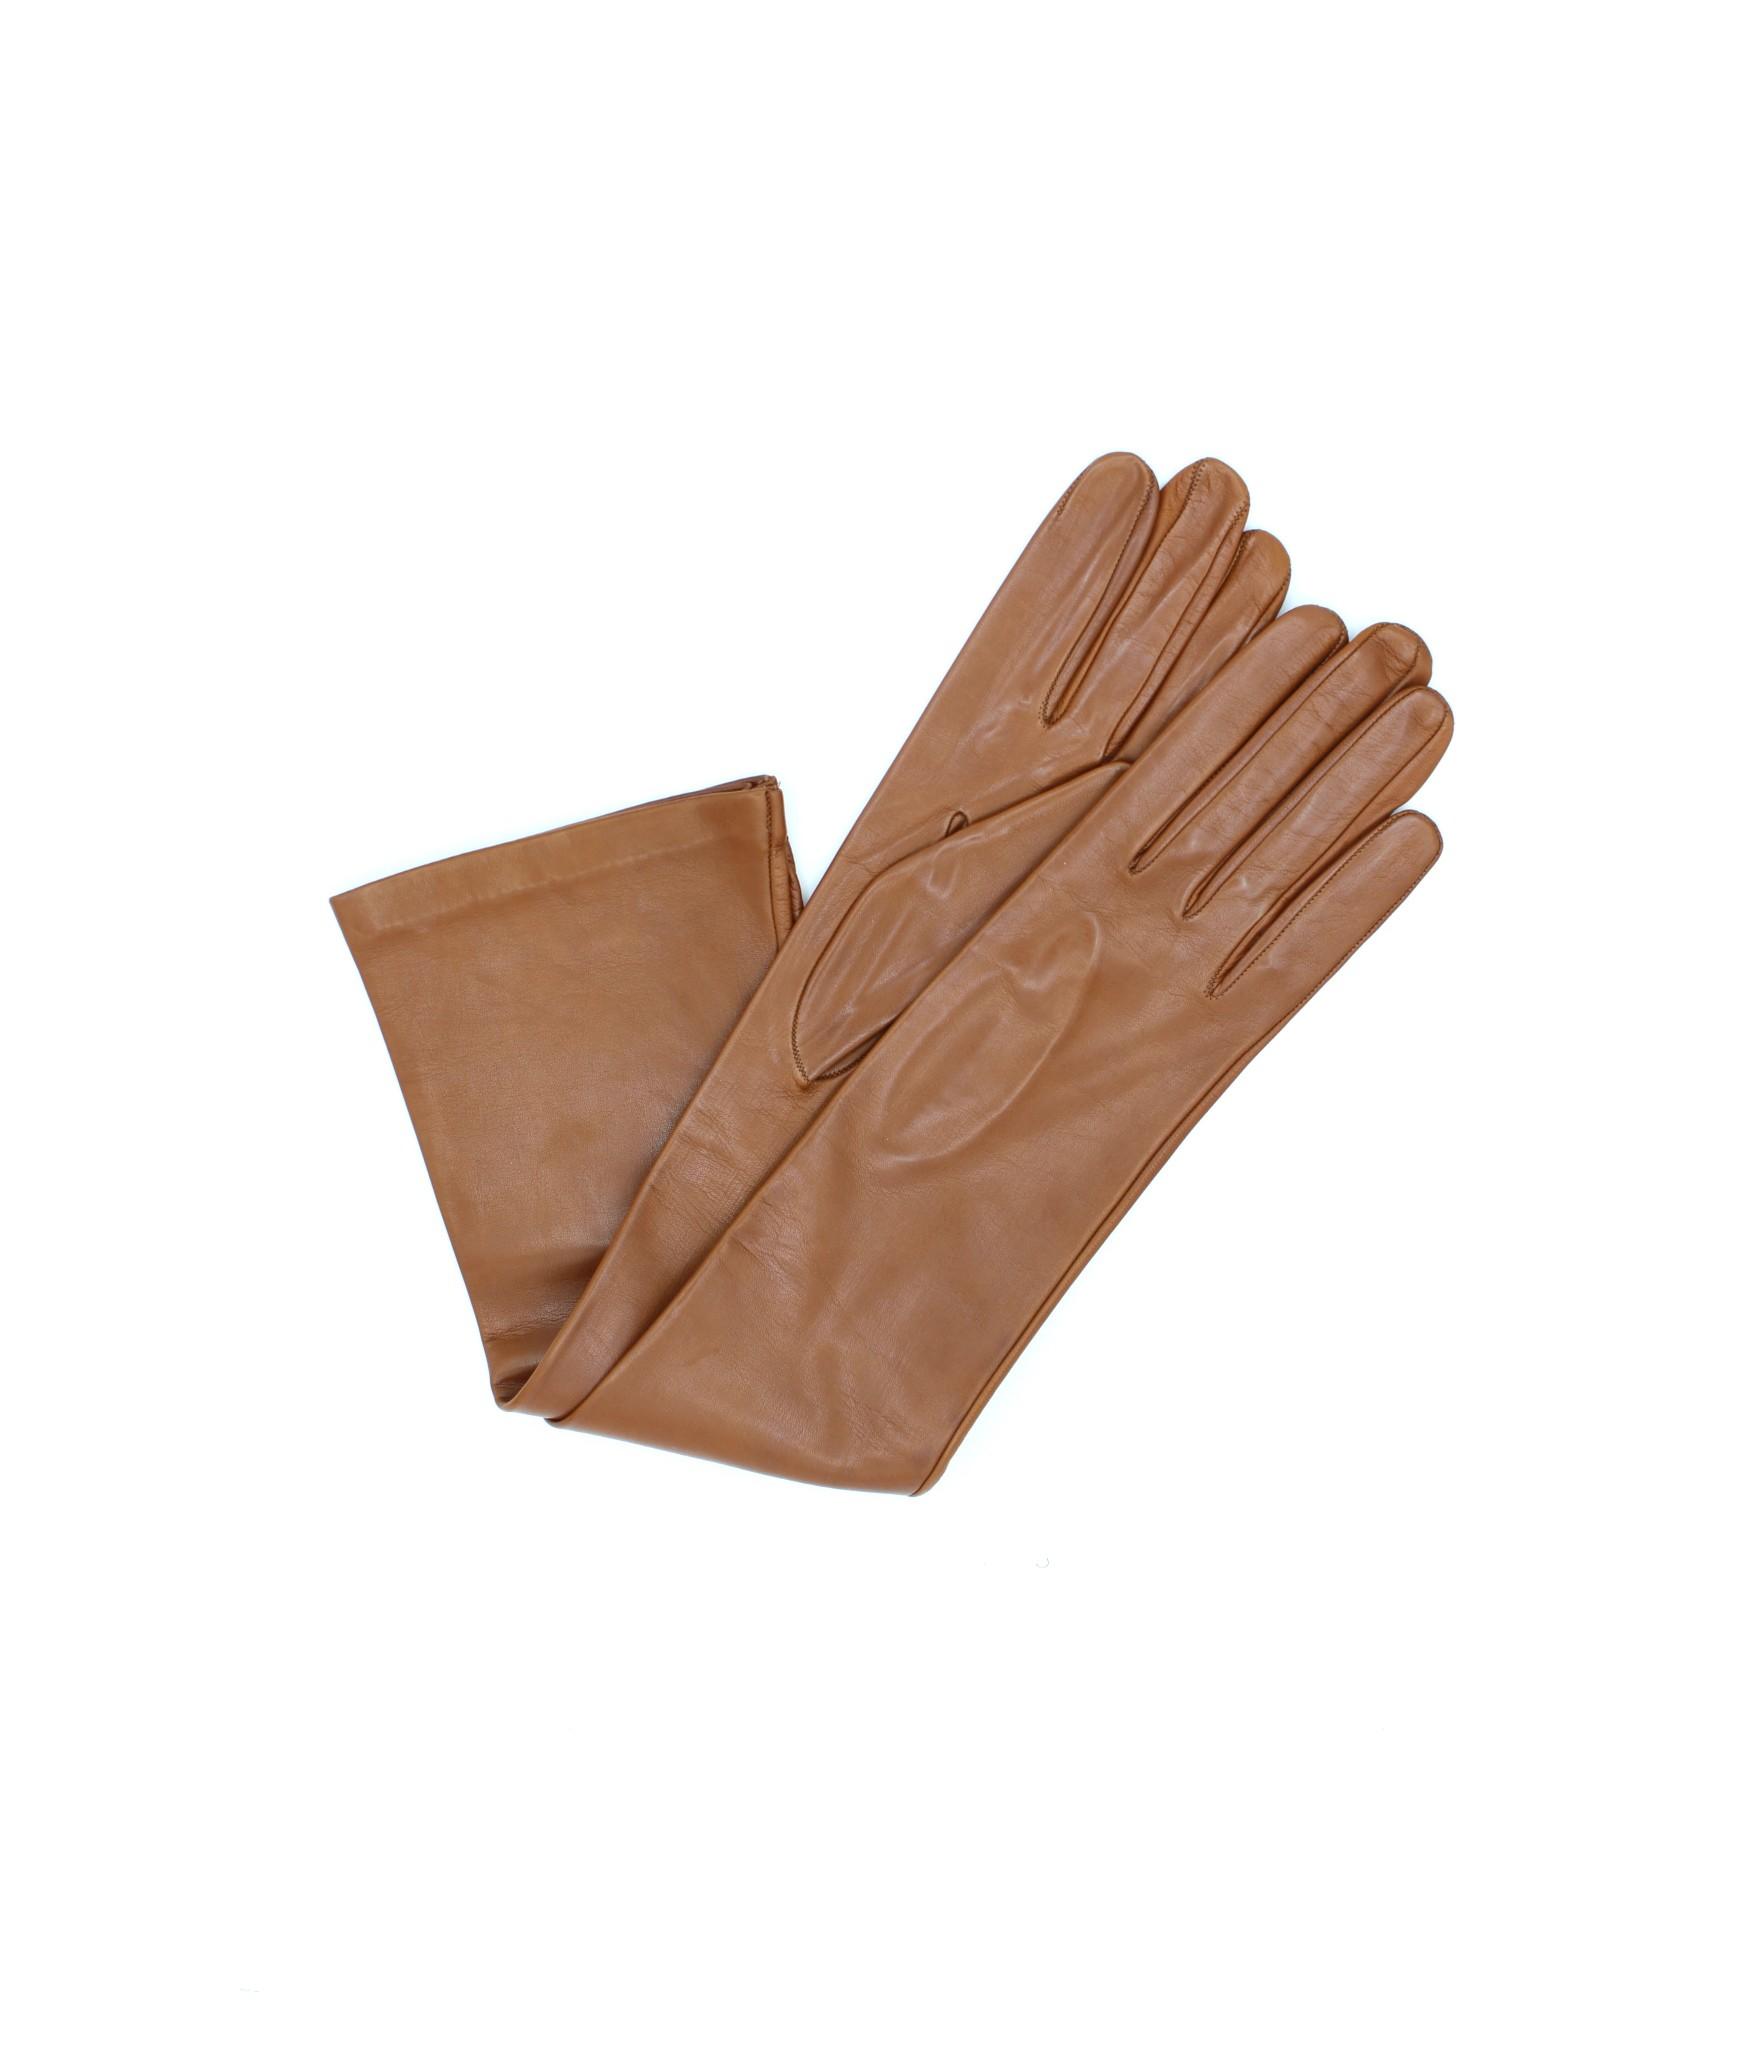 Nappa leather gloves 10bt silk lined Tan Sermoneta Gloves